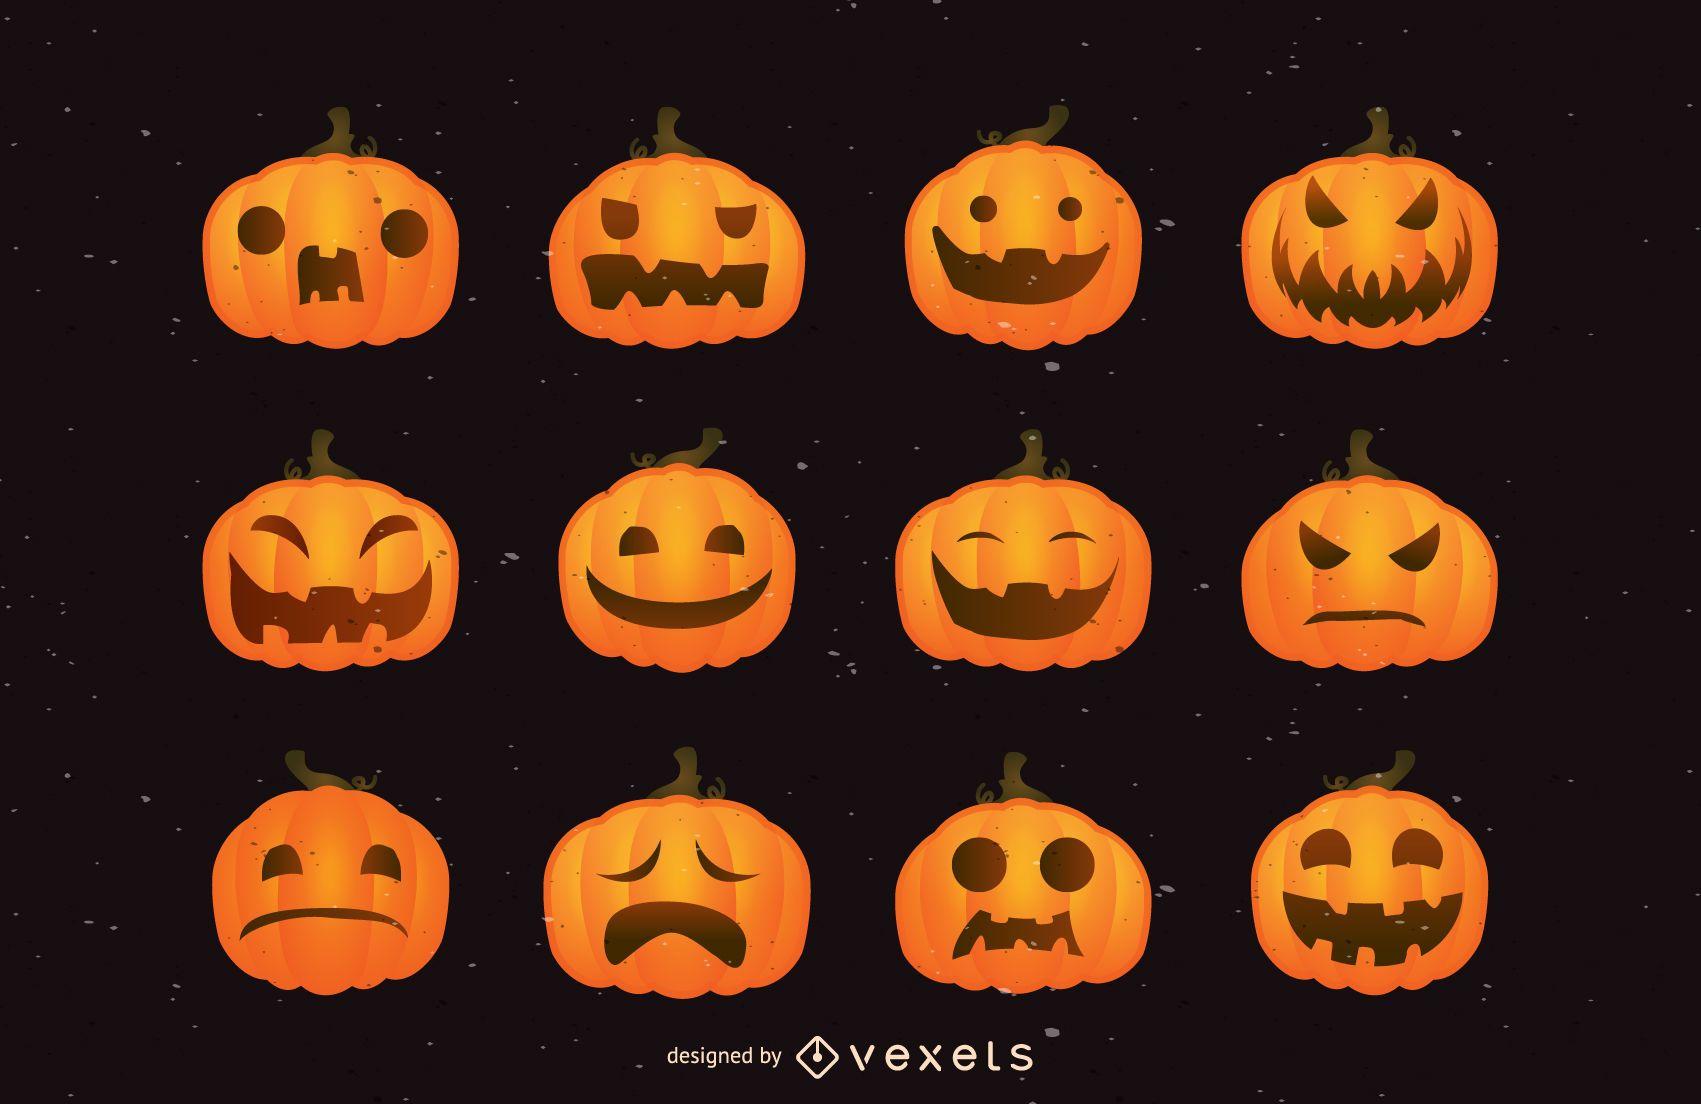 Funny Pumpkin Face Pack